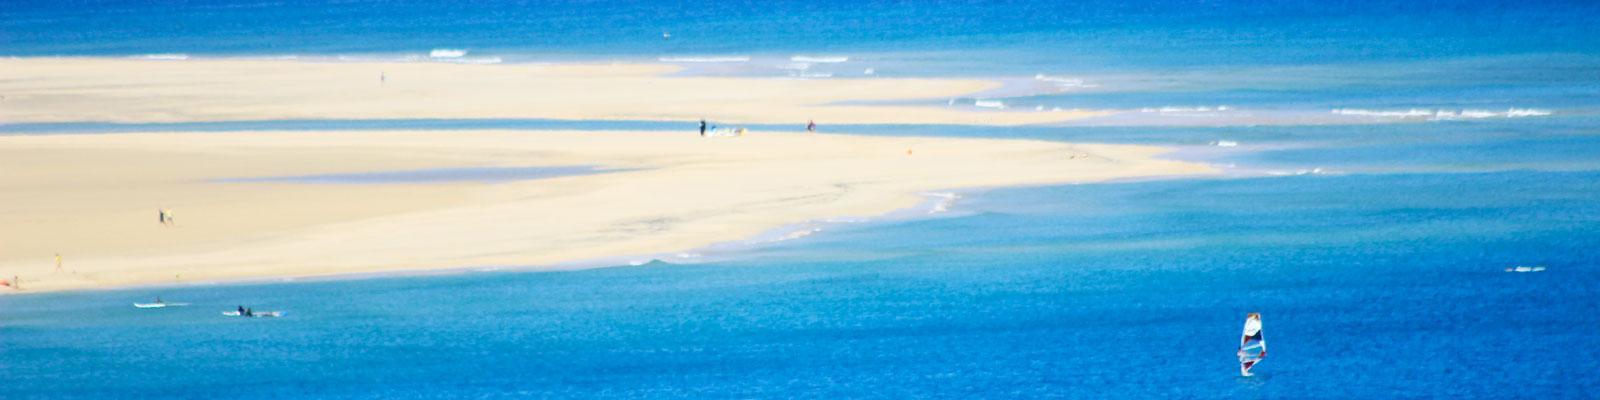 Southern Island Tour Fuerteventura